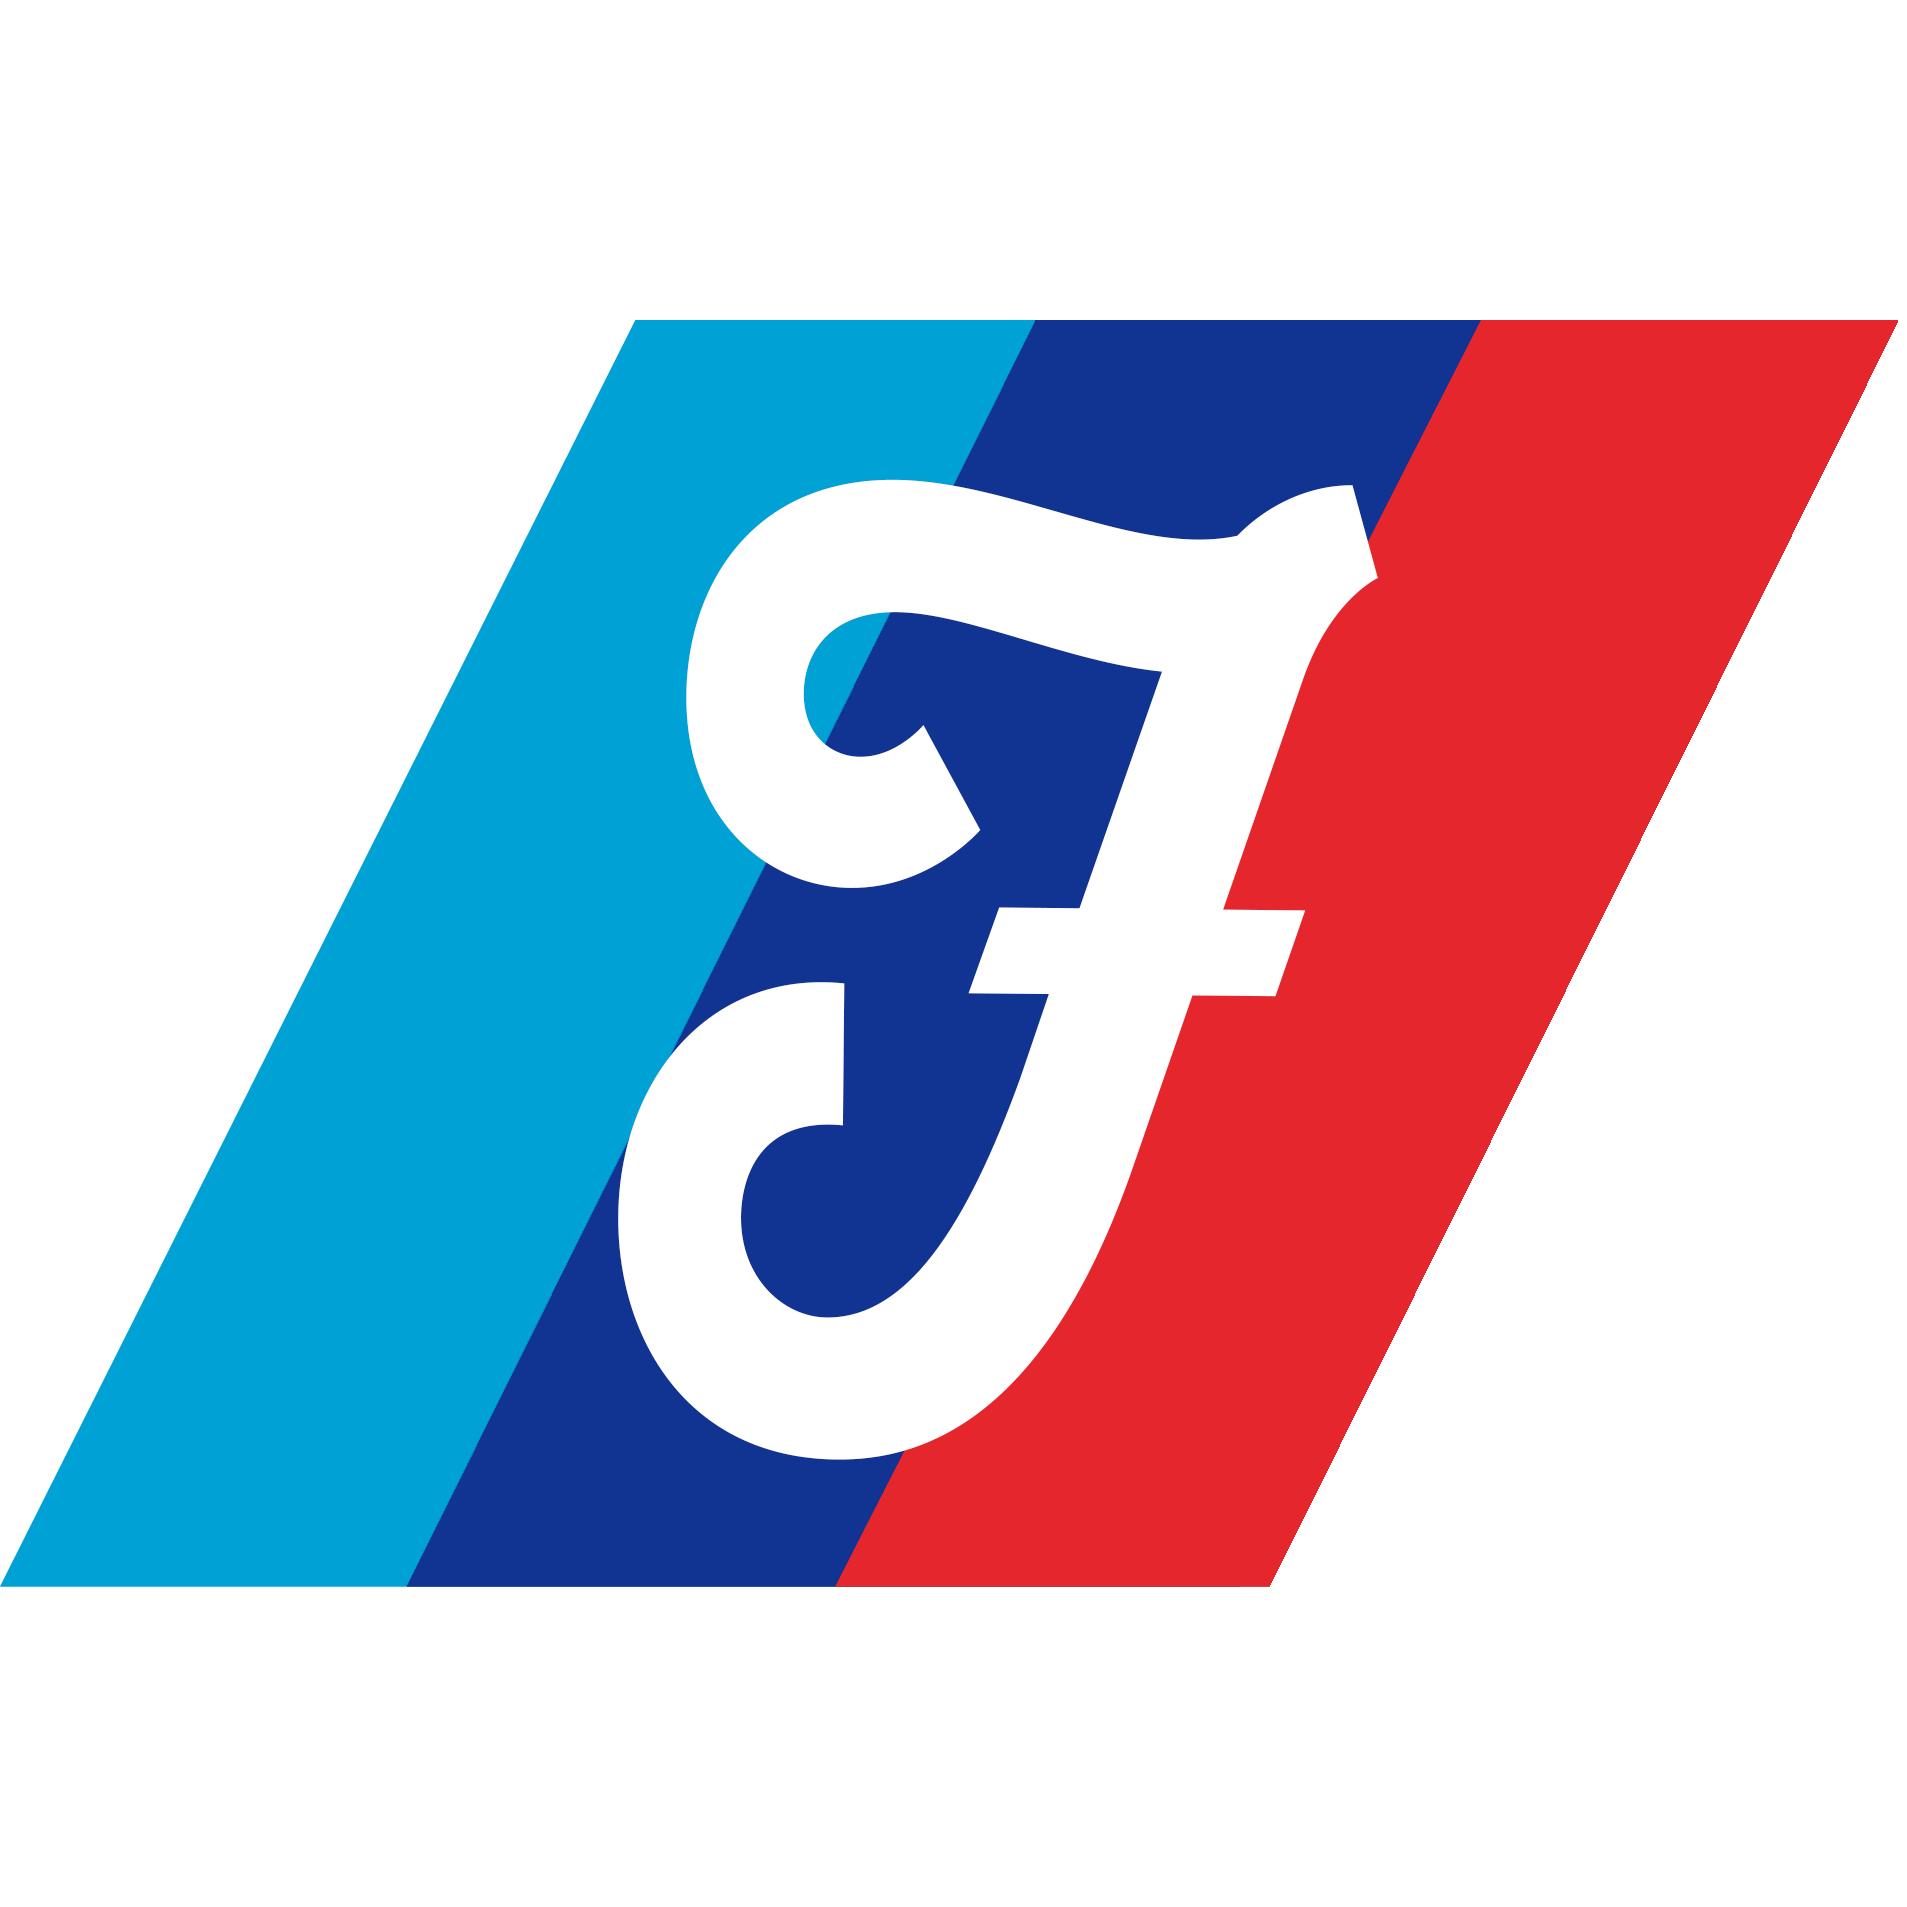 F-LOGO-WEBICON.png